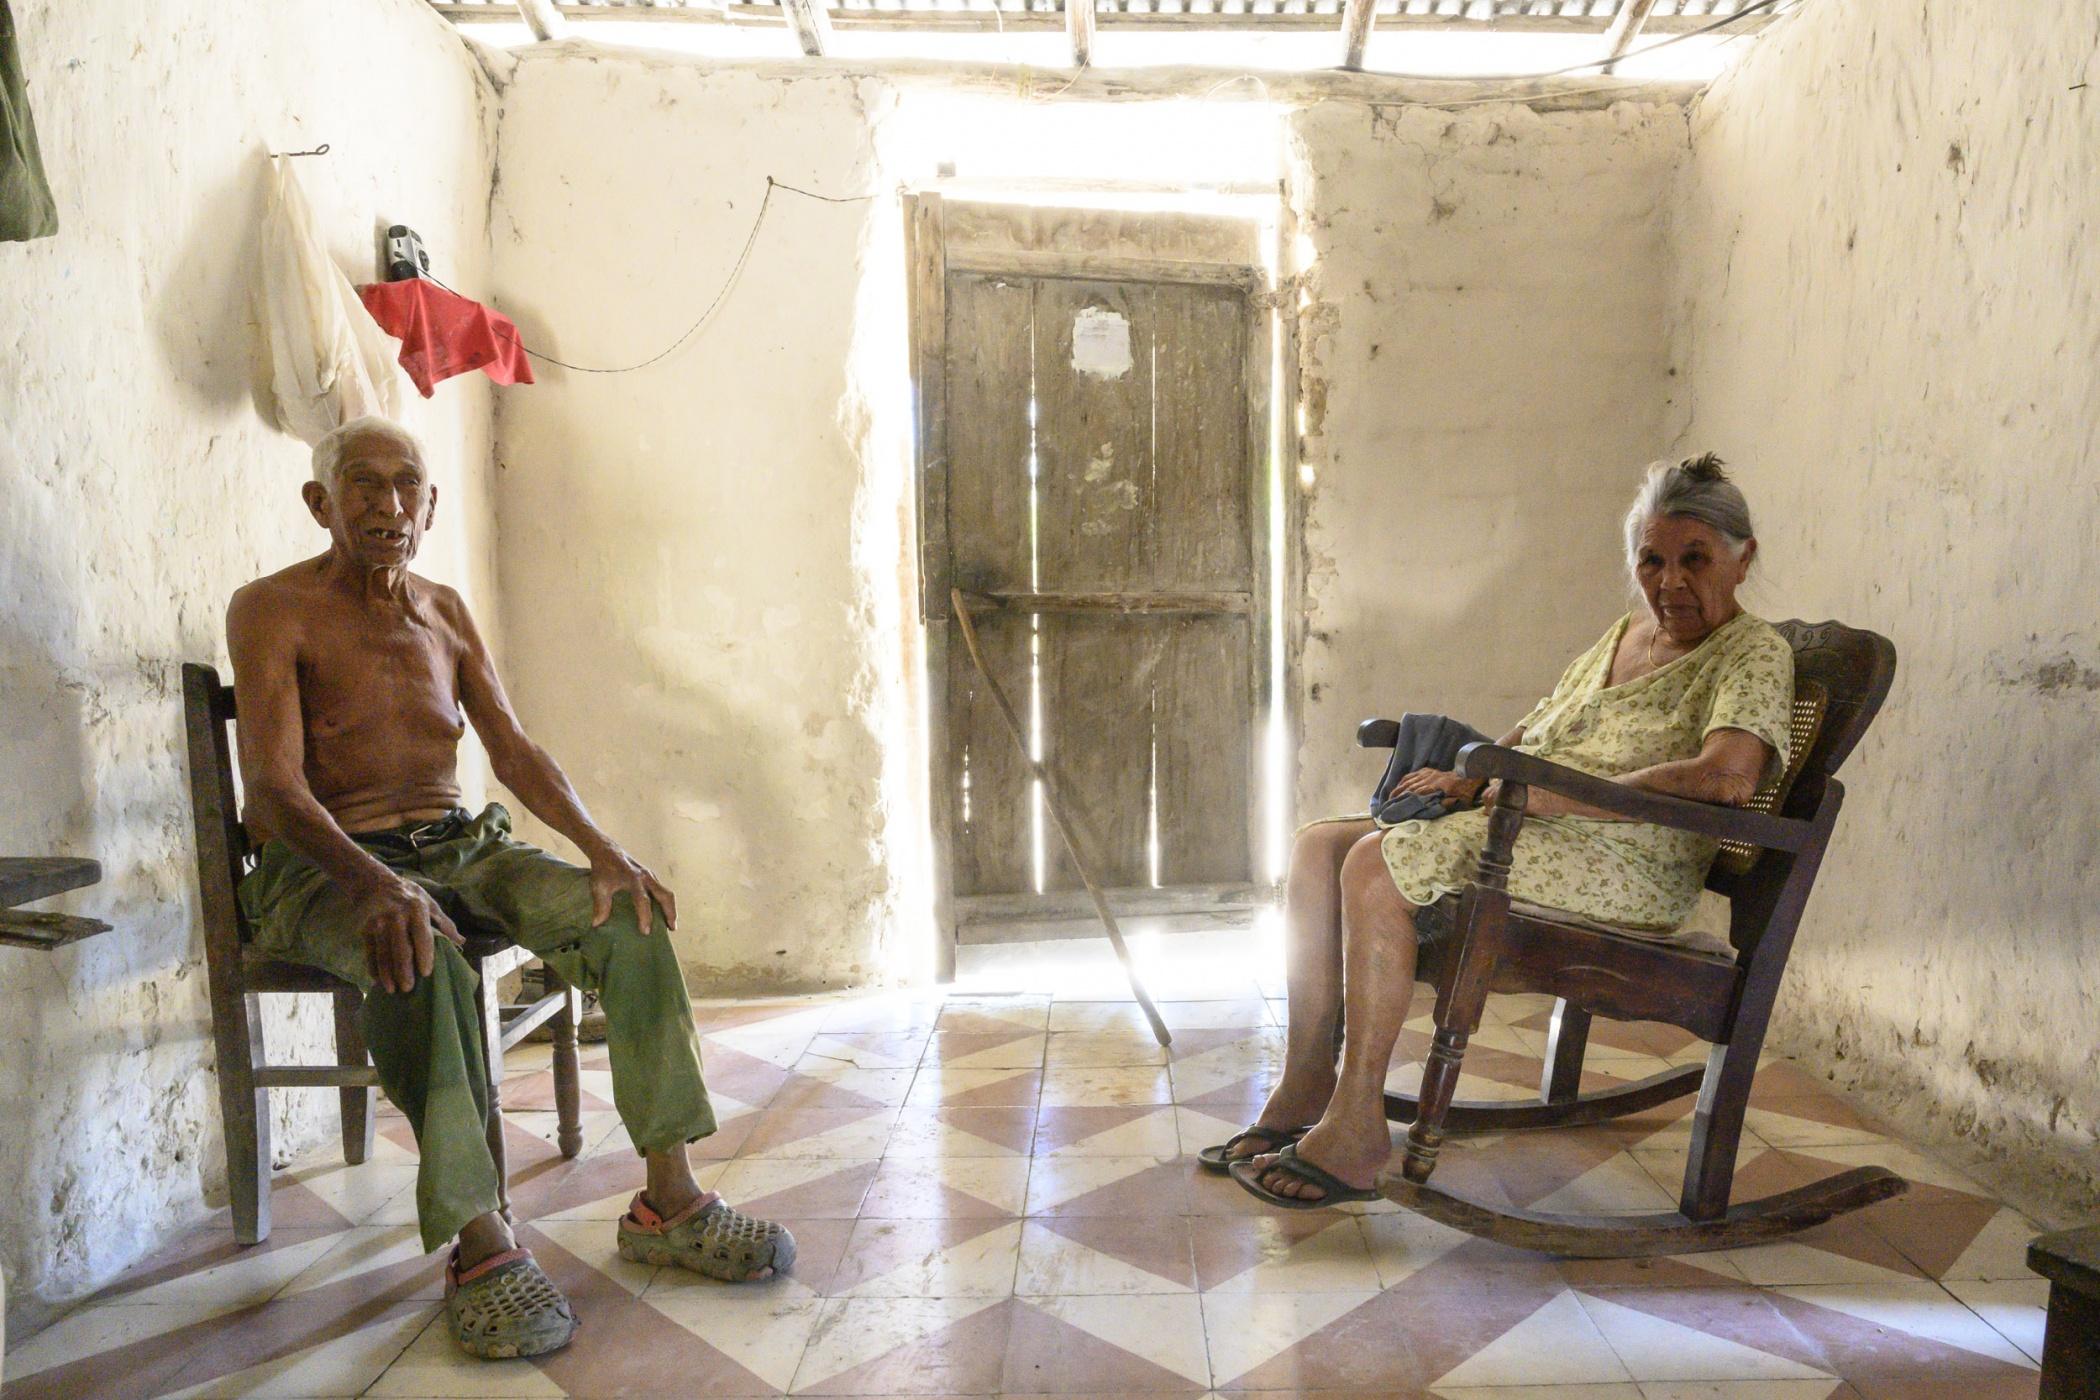 Interior 2 - Cuba - Hector Garrido, Aerial and human photography